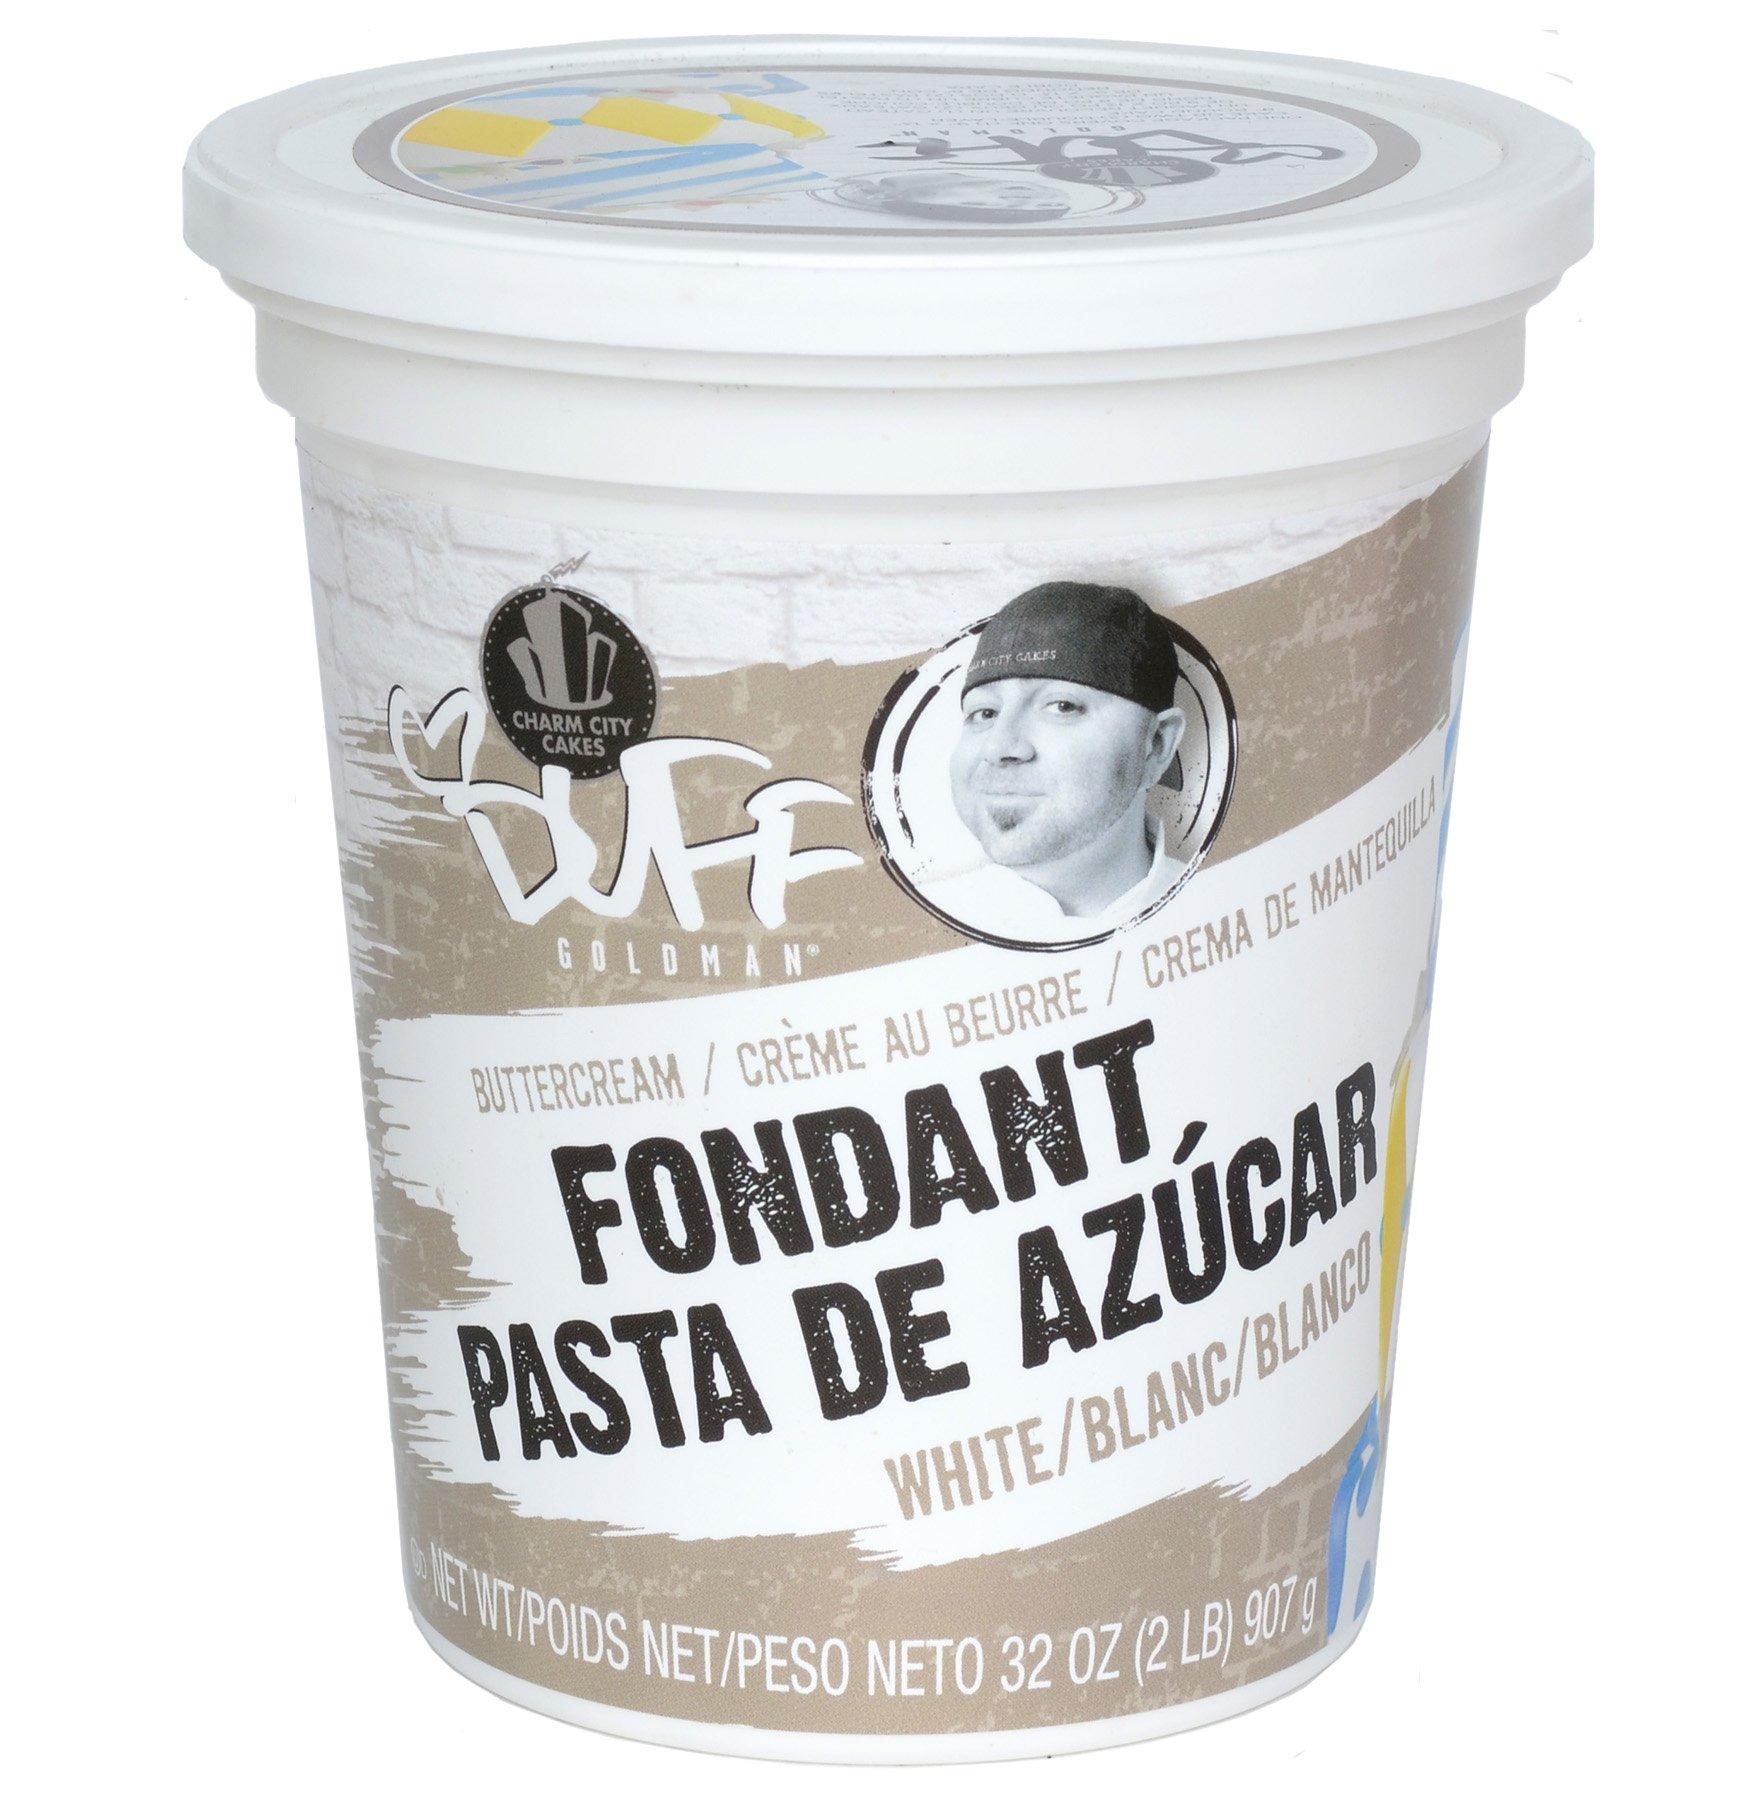 Duff - Buttercream Fondant 2Lb, White